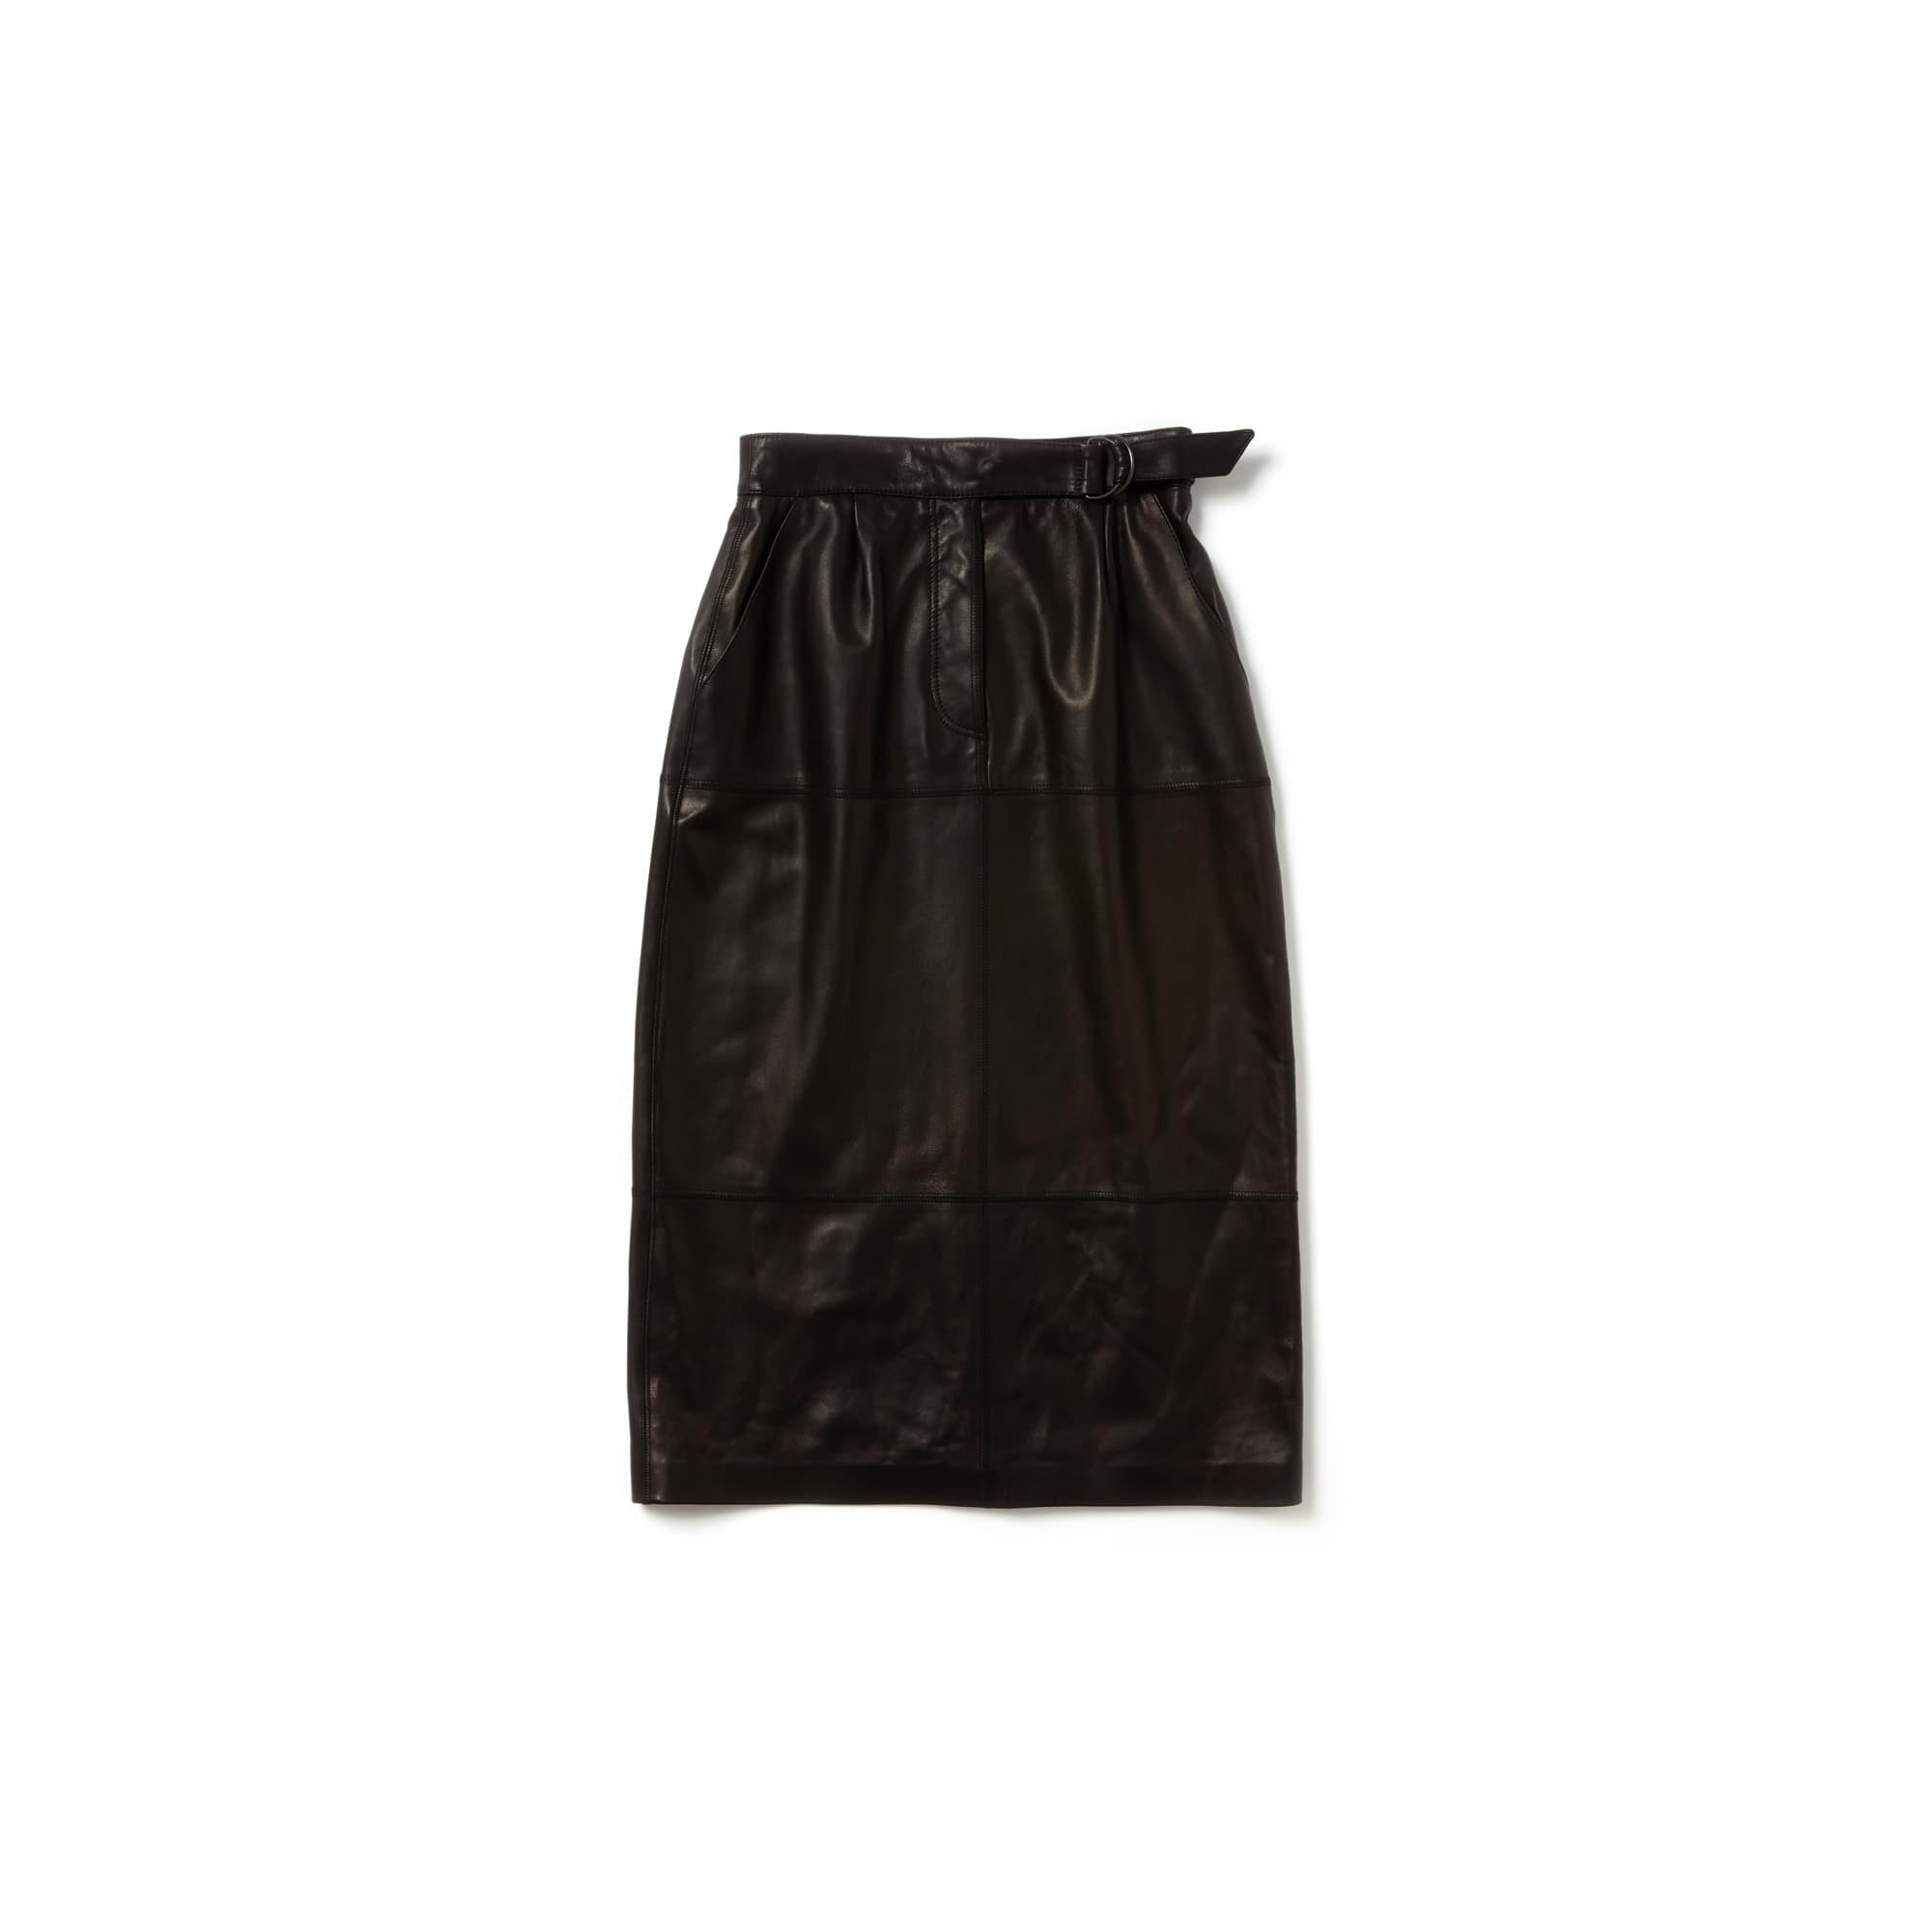 Women's Fashion Show High Waisted Soft Leather Skirt